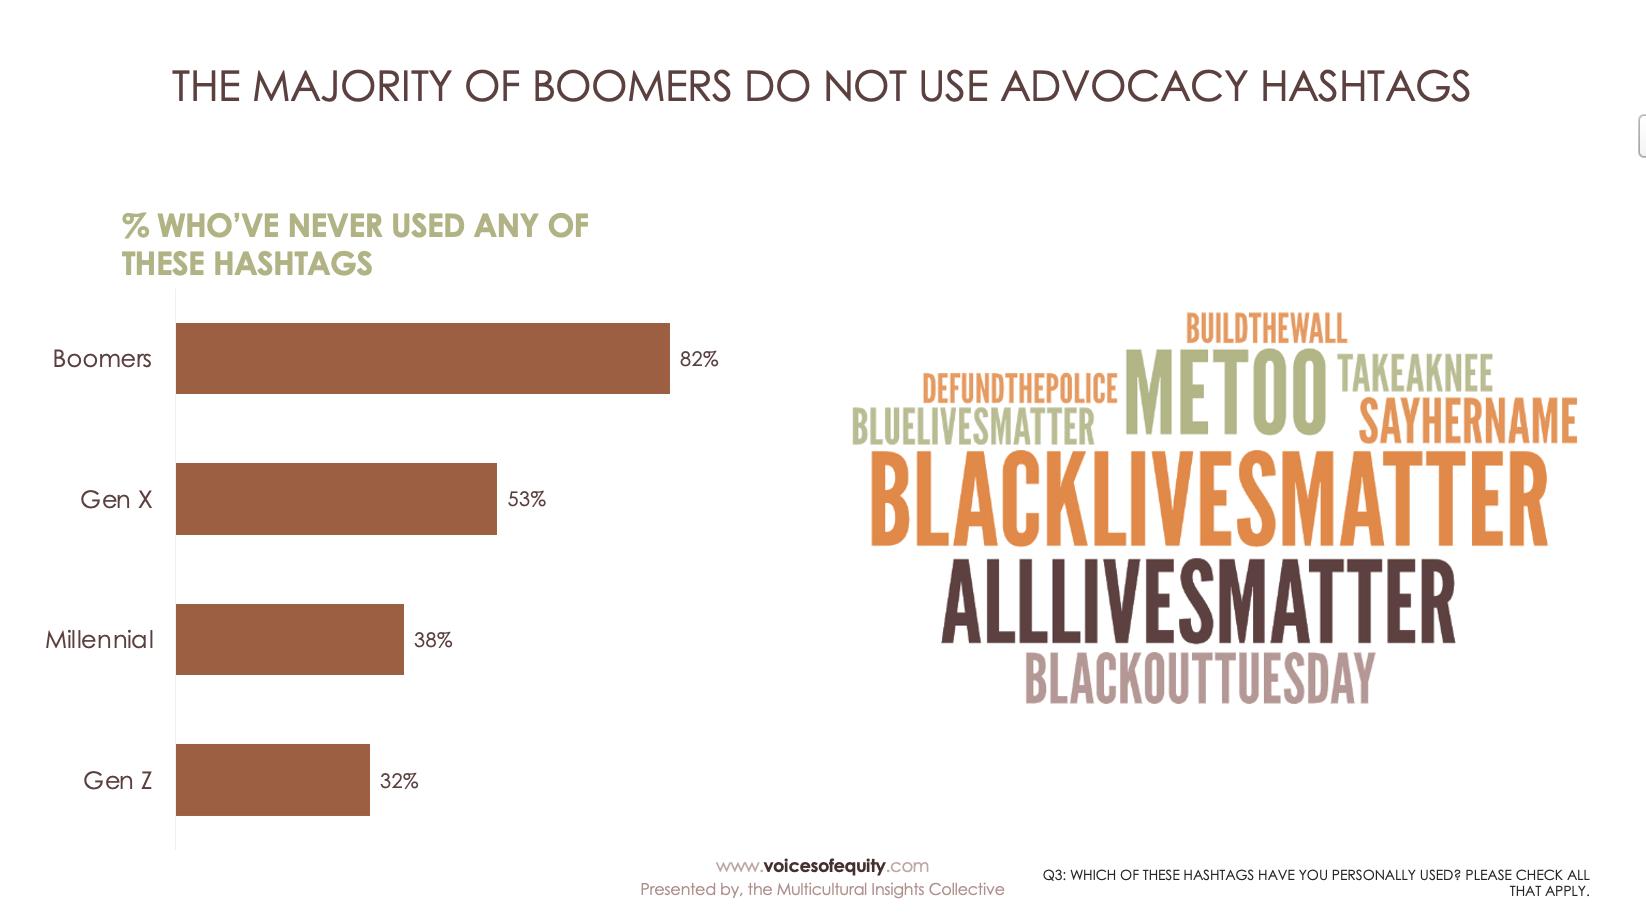 Advocacy hashtag breakdown by generation